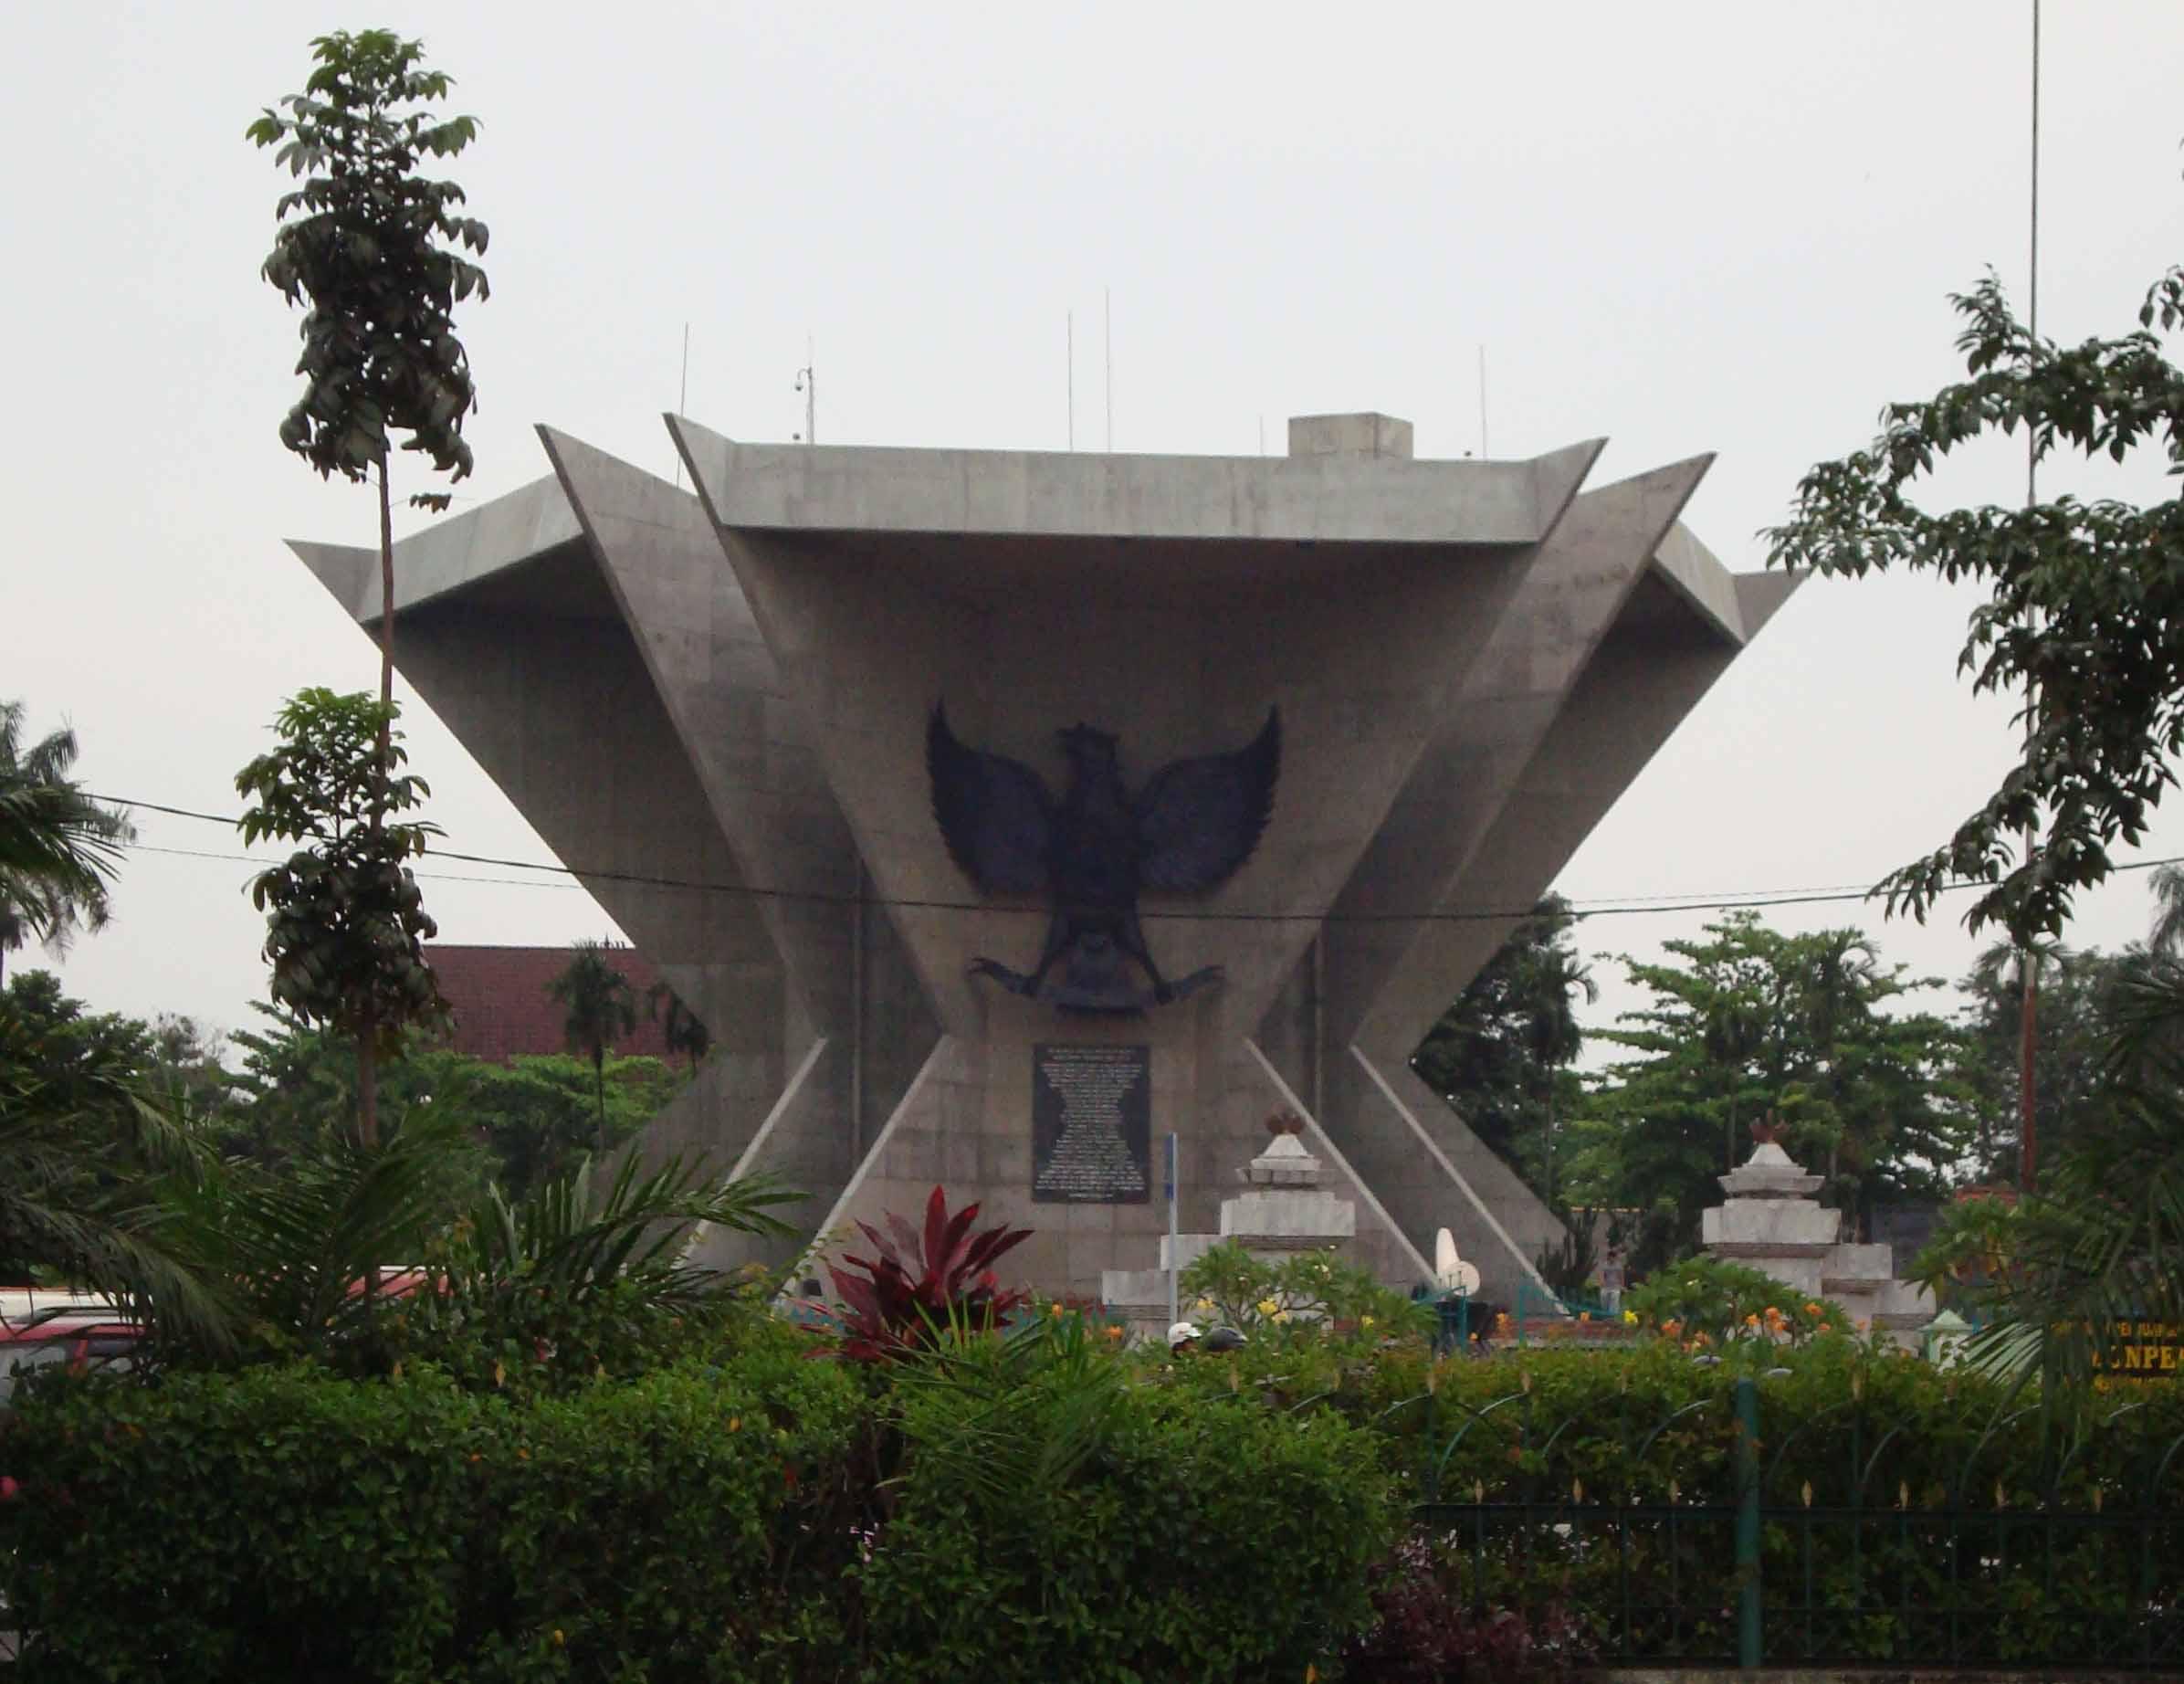 Tribun Ilmu Tempat Wisata Palembangtribunilmu Monumen Perjuangan Rakyat Palembang Terletak